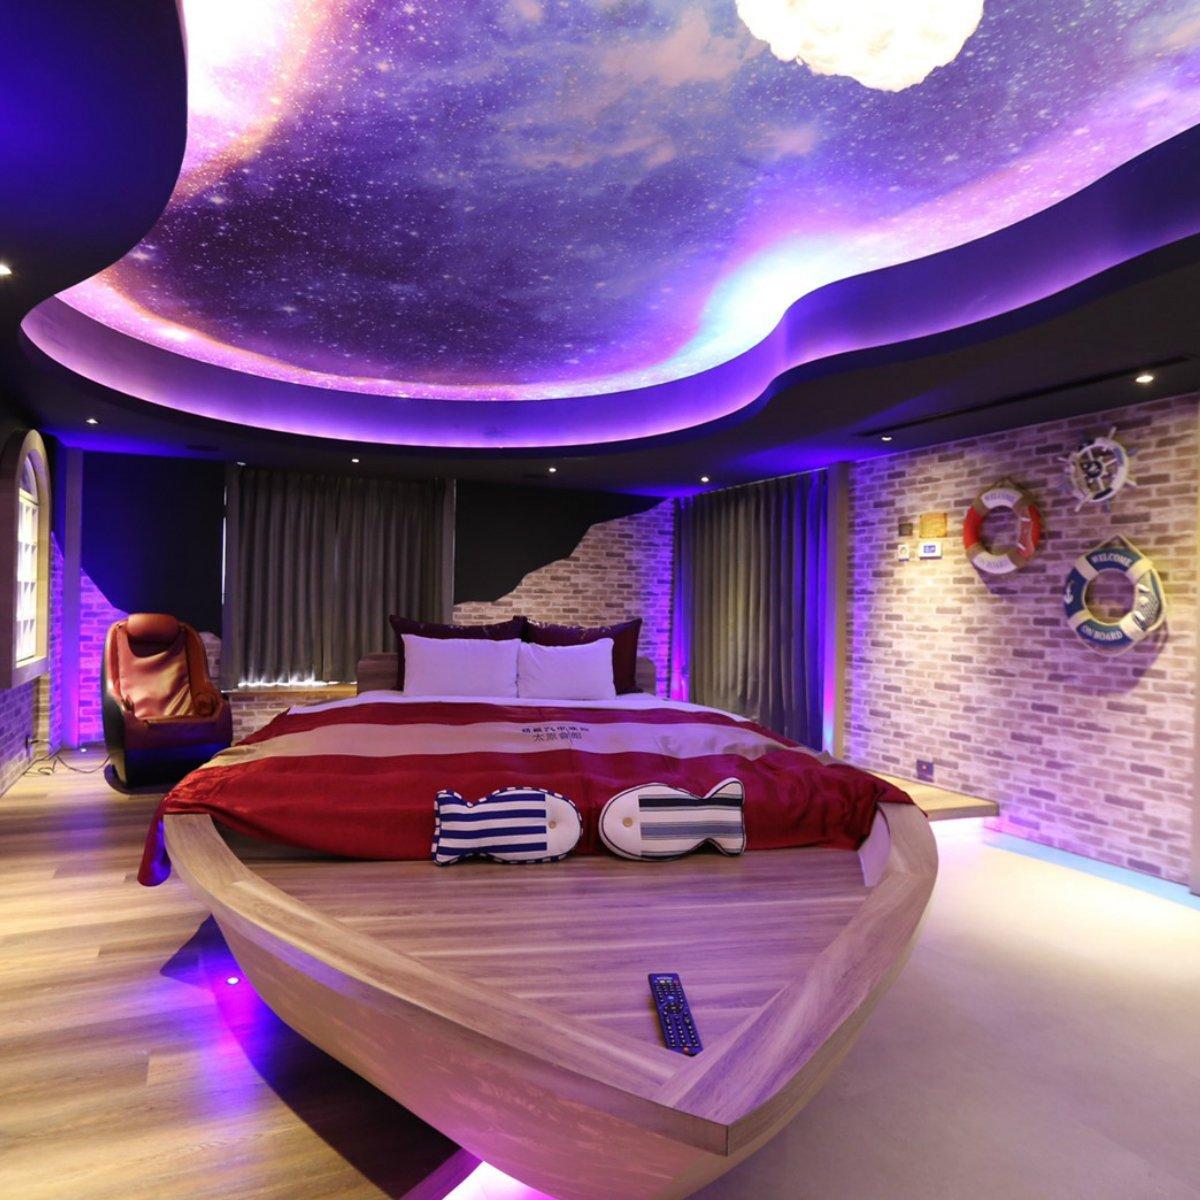 motel-style-room